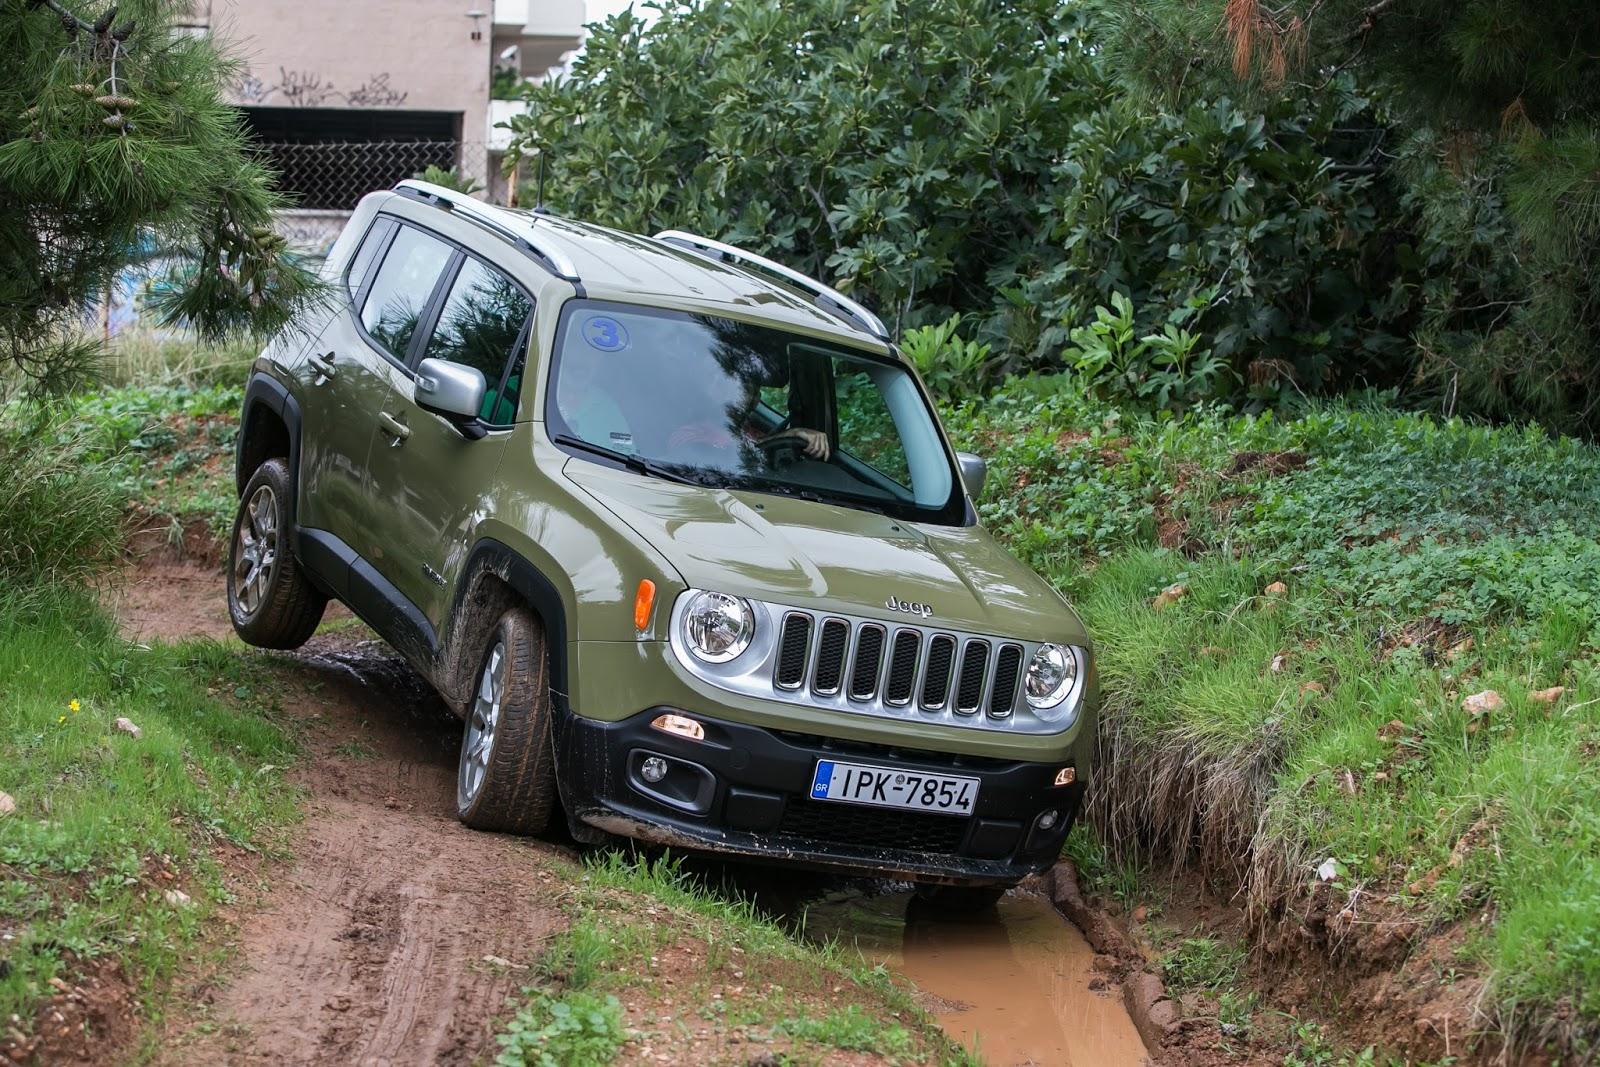 KF 1515 High Definition εμπειρία οδήγησης με την 7 ιντσών HD LCD οθόνη οργάνων του Jeep Renegade Jeep, Jeep Renegade, Τεχνολογία